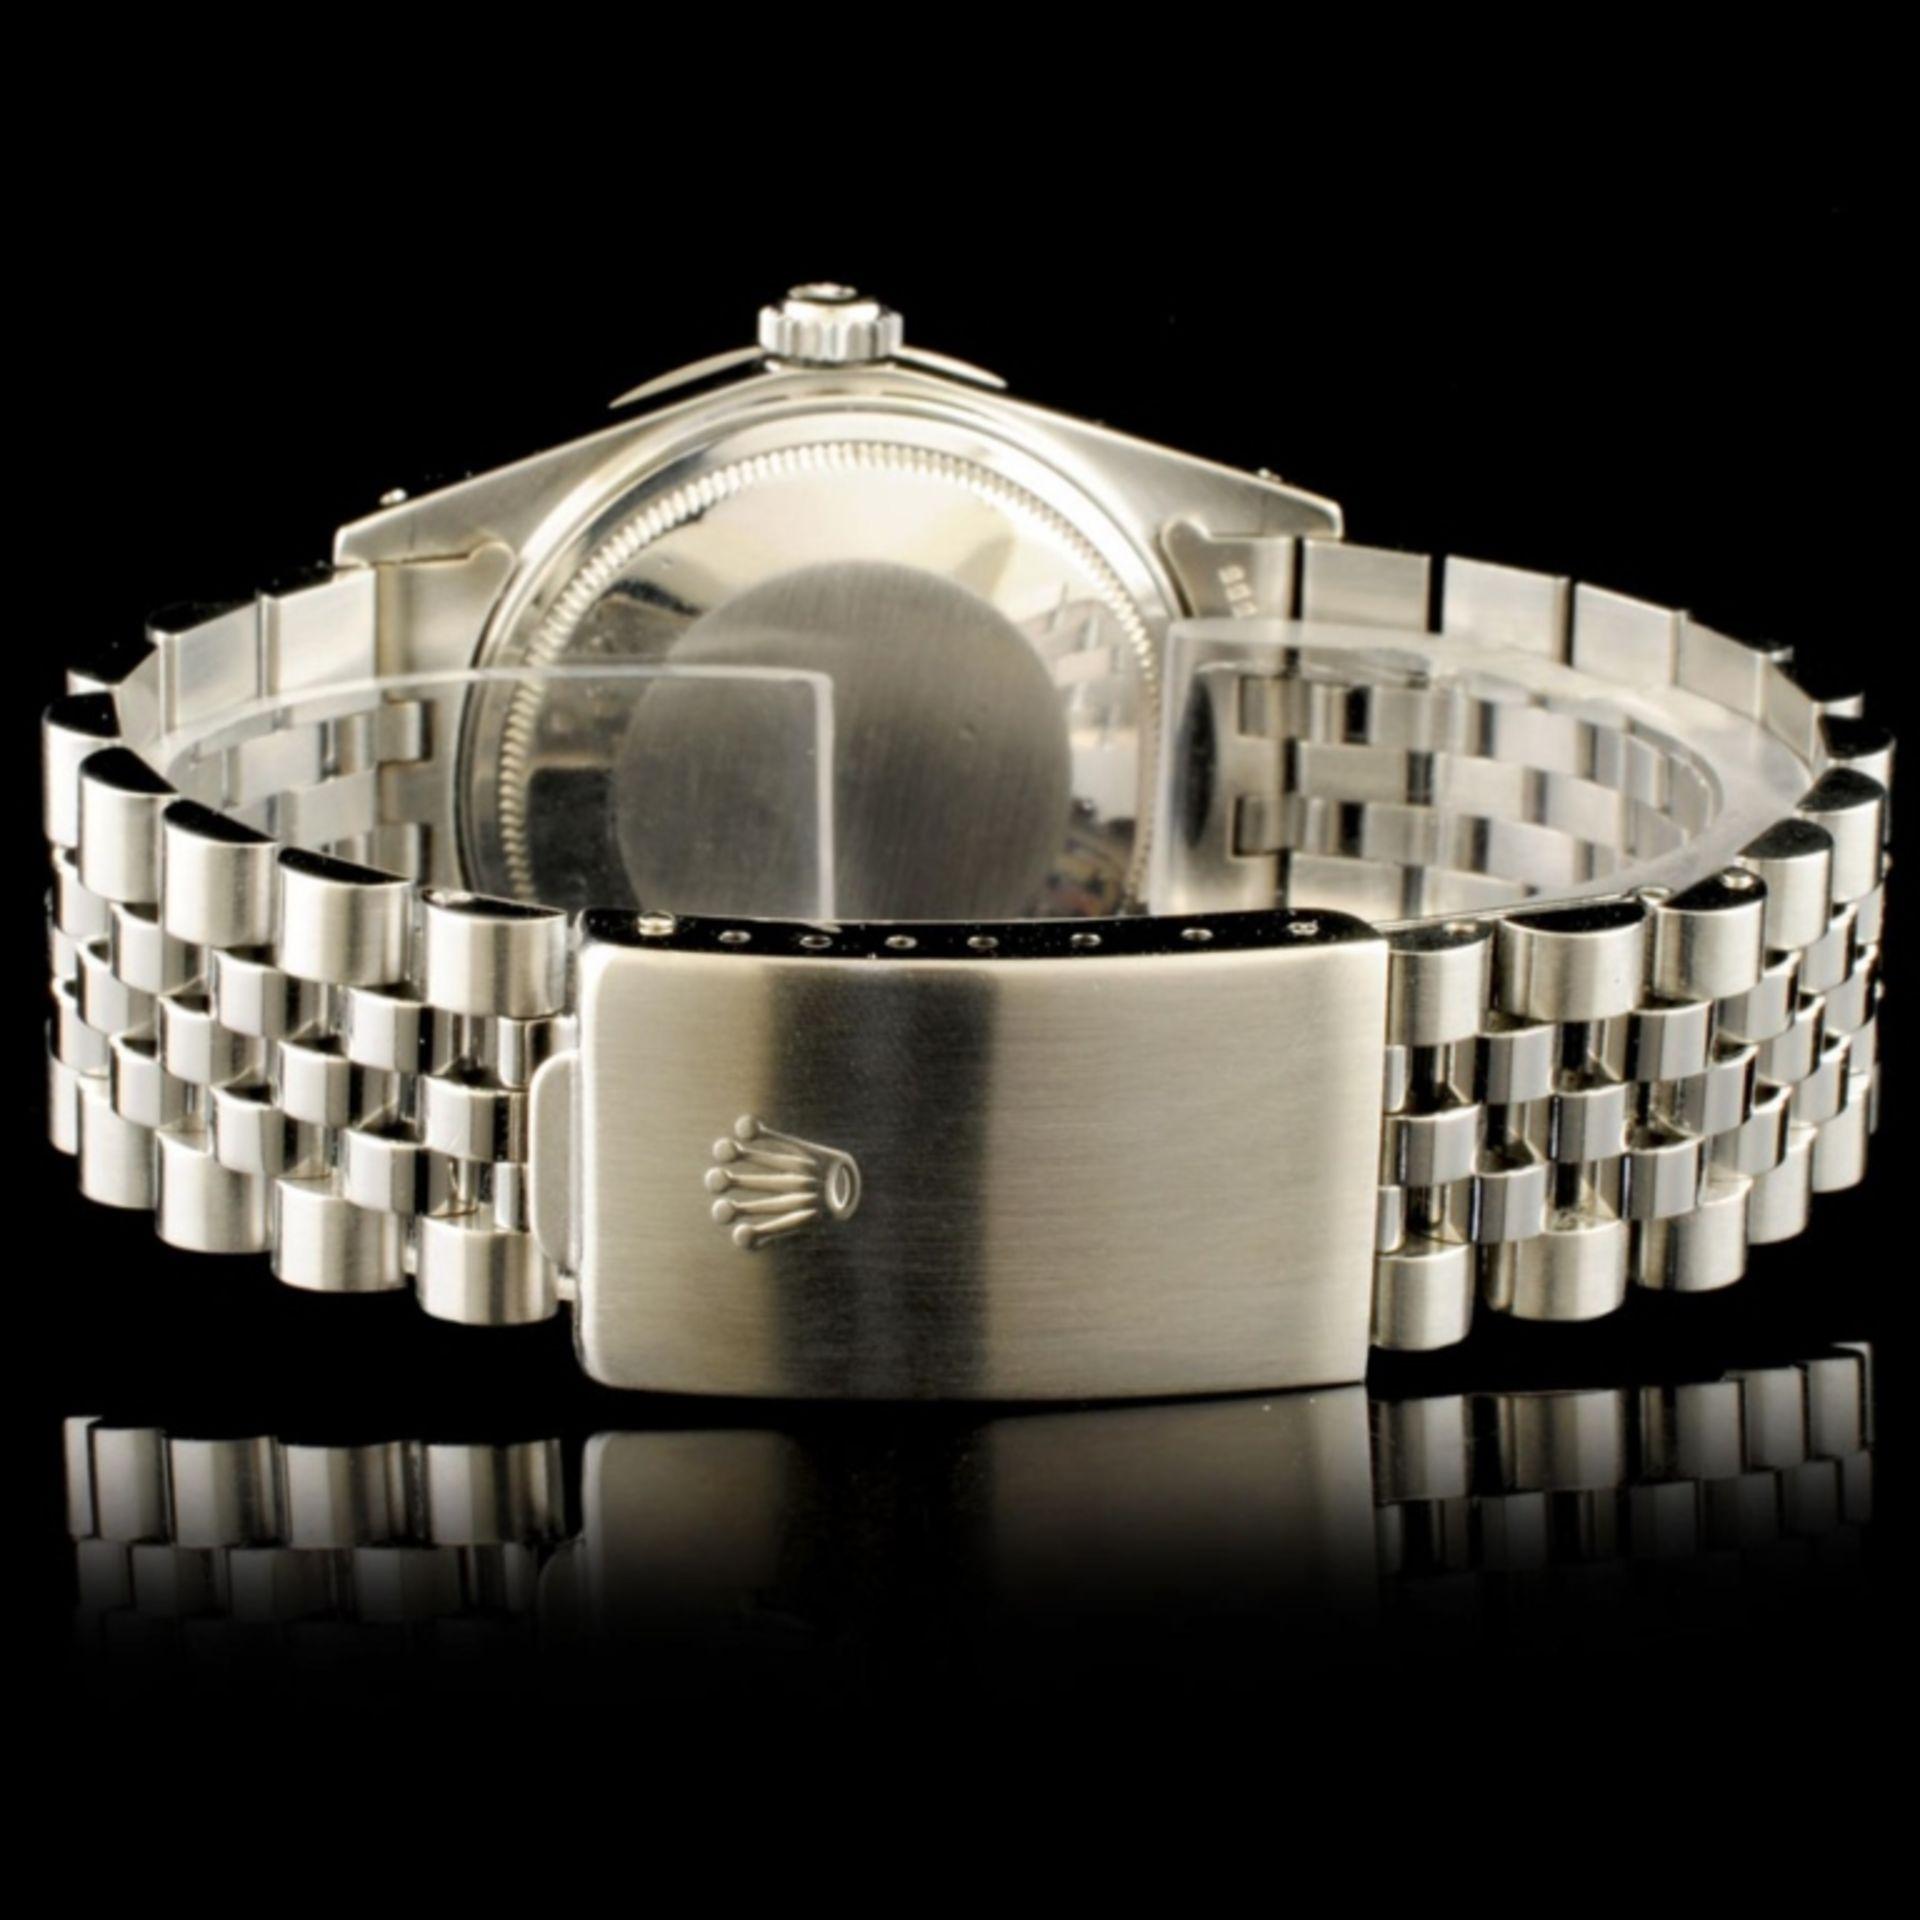 Rolex DateJust 1.35ct Diamond 36MM Wristwatch - Image 3 of 4